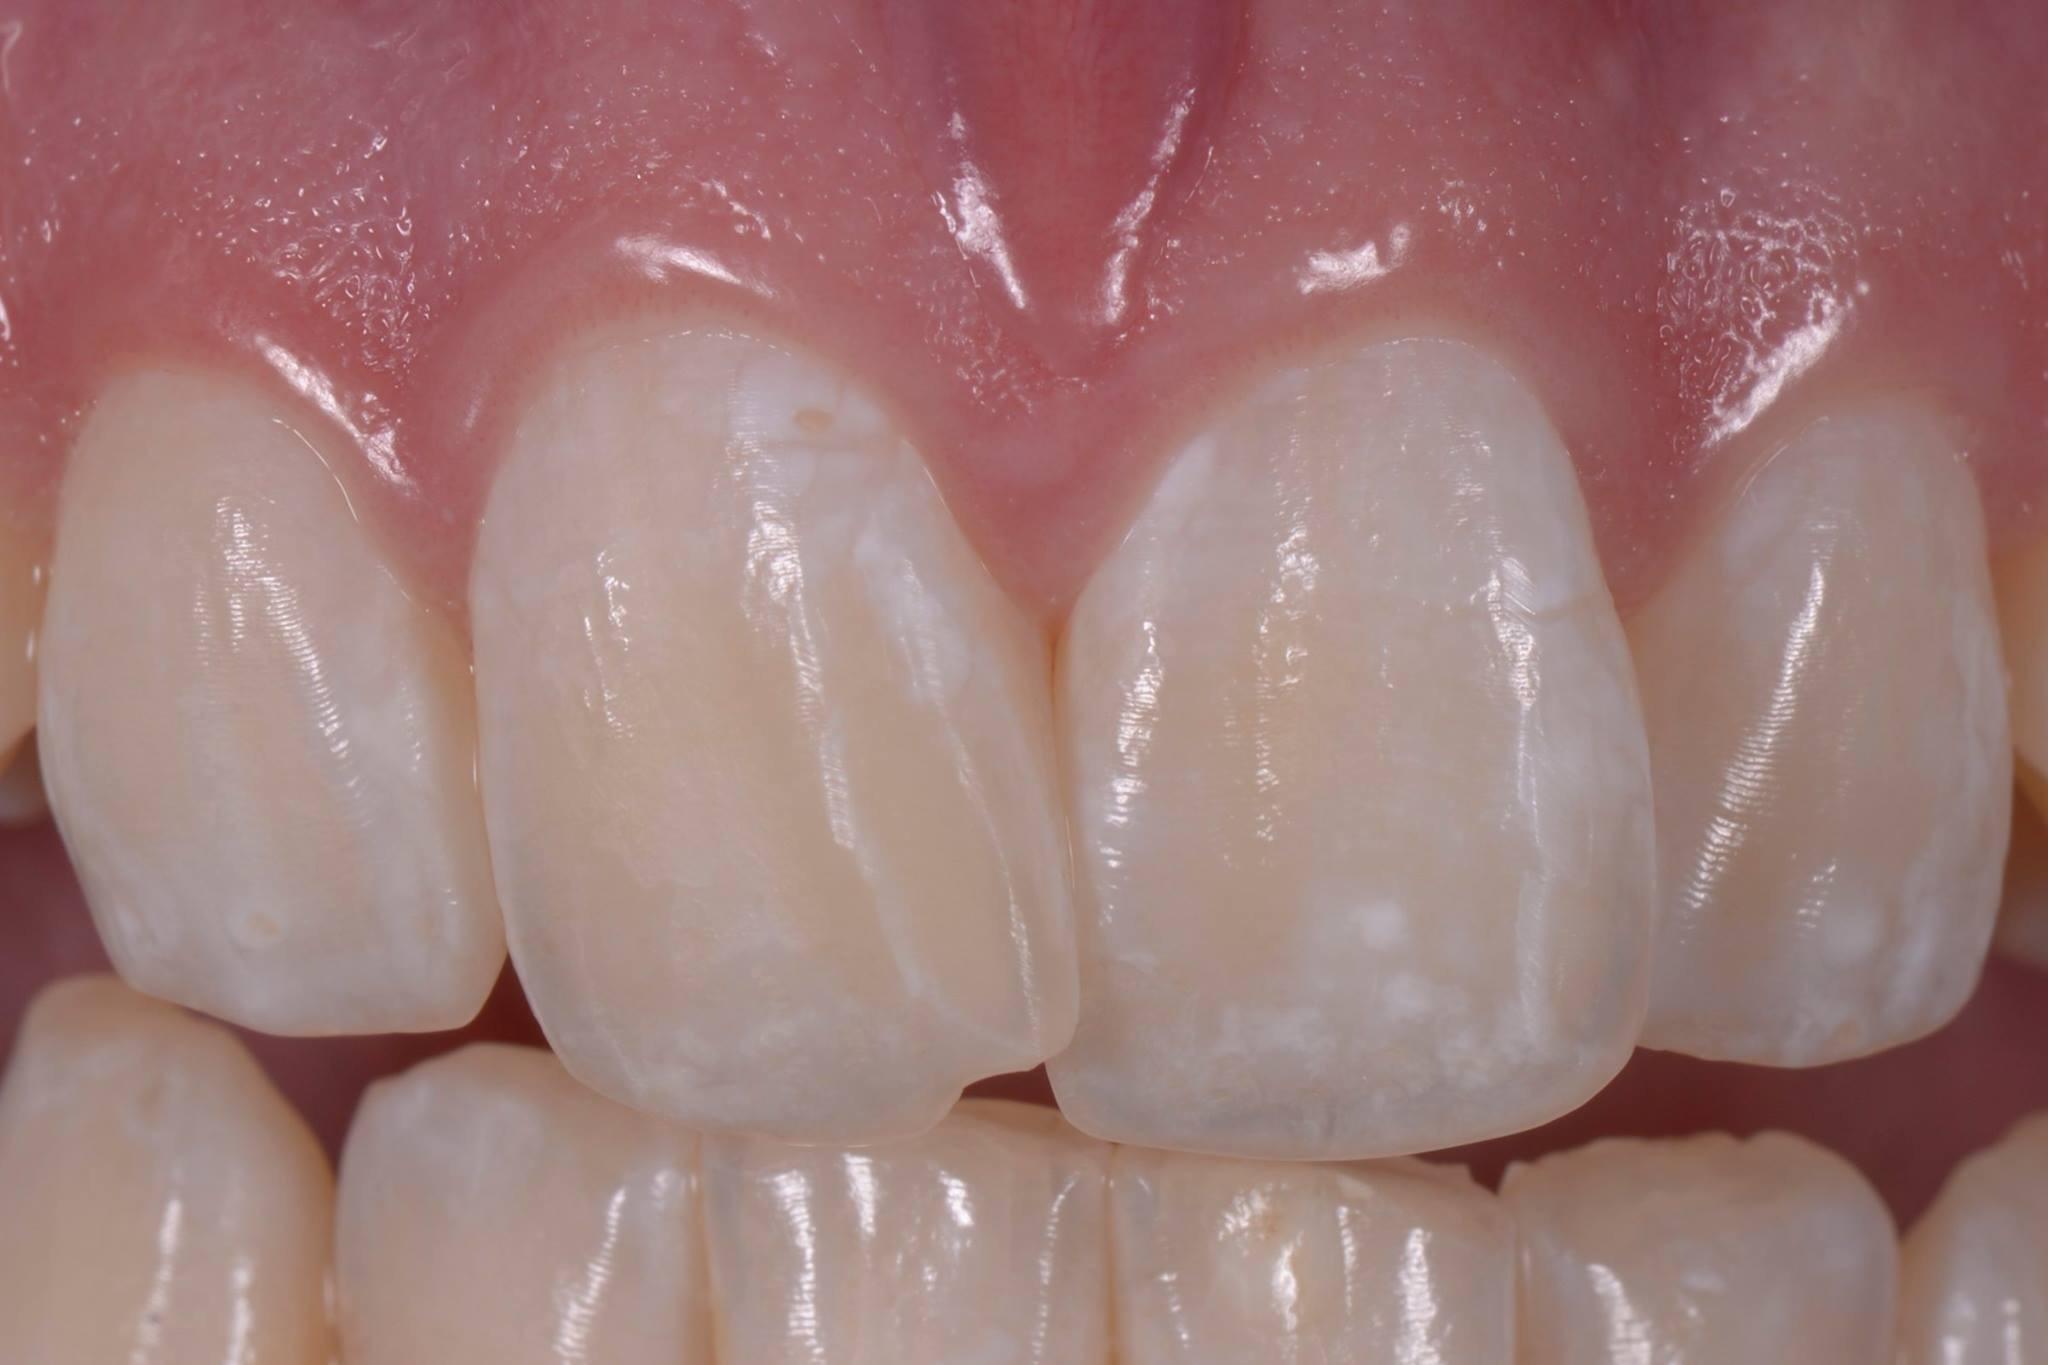 Zahnprobleme mit Folgen